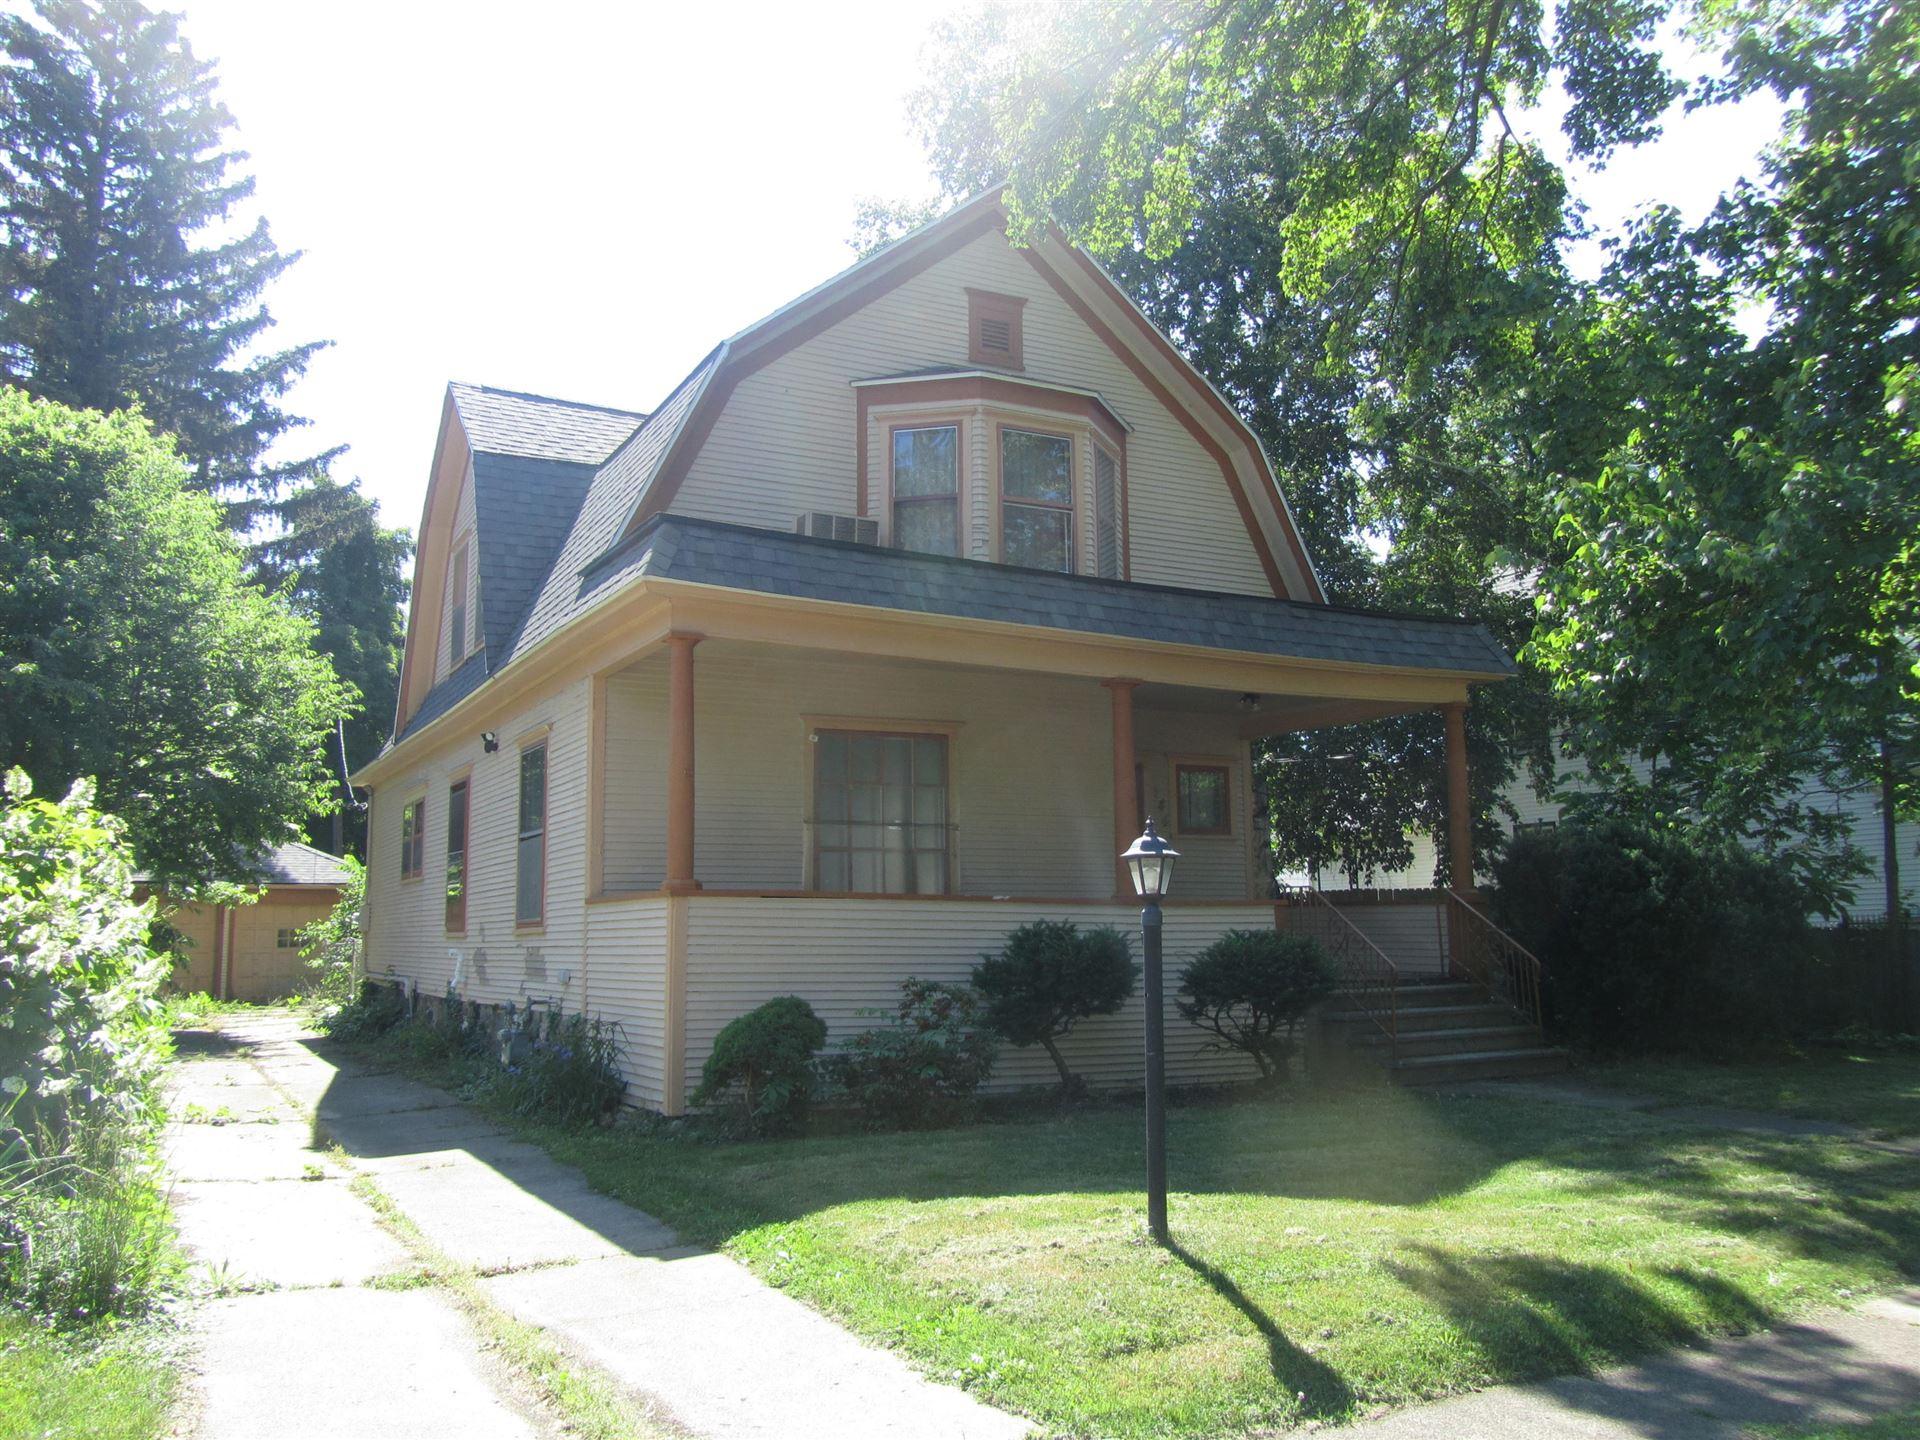 144 Chestnut Street, Battle Creek, MI 49017 - MLS#: 21011665